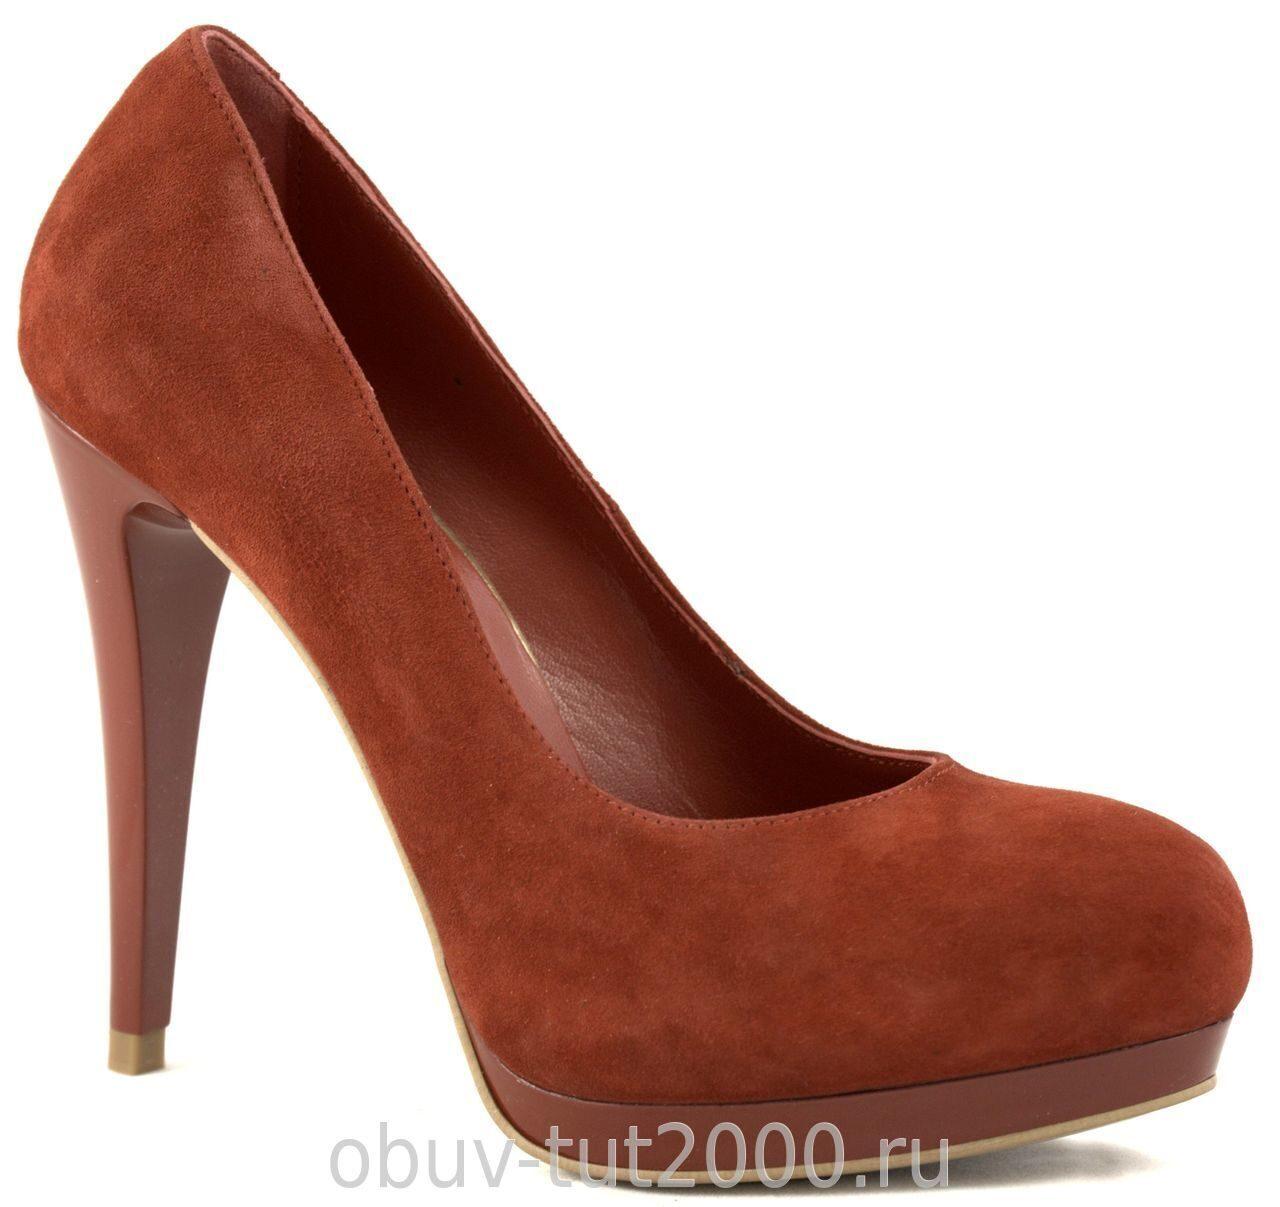 Магазин обуви torrinibeauty ru